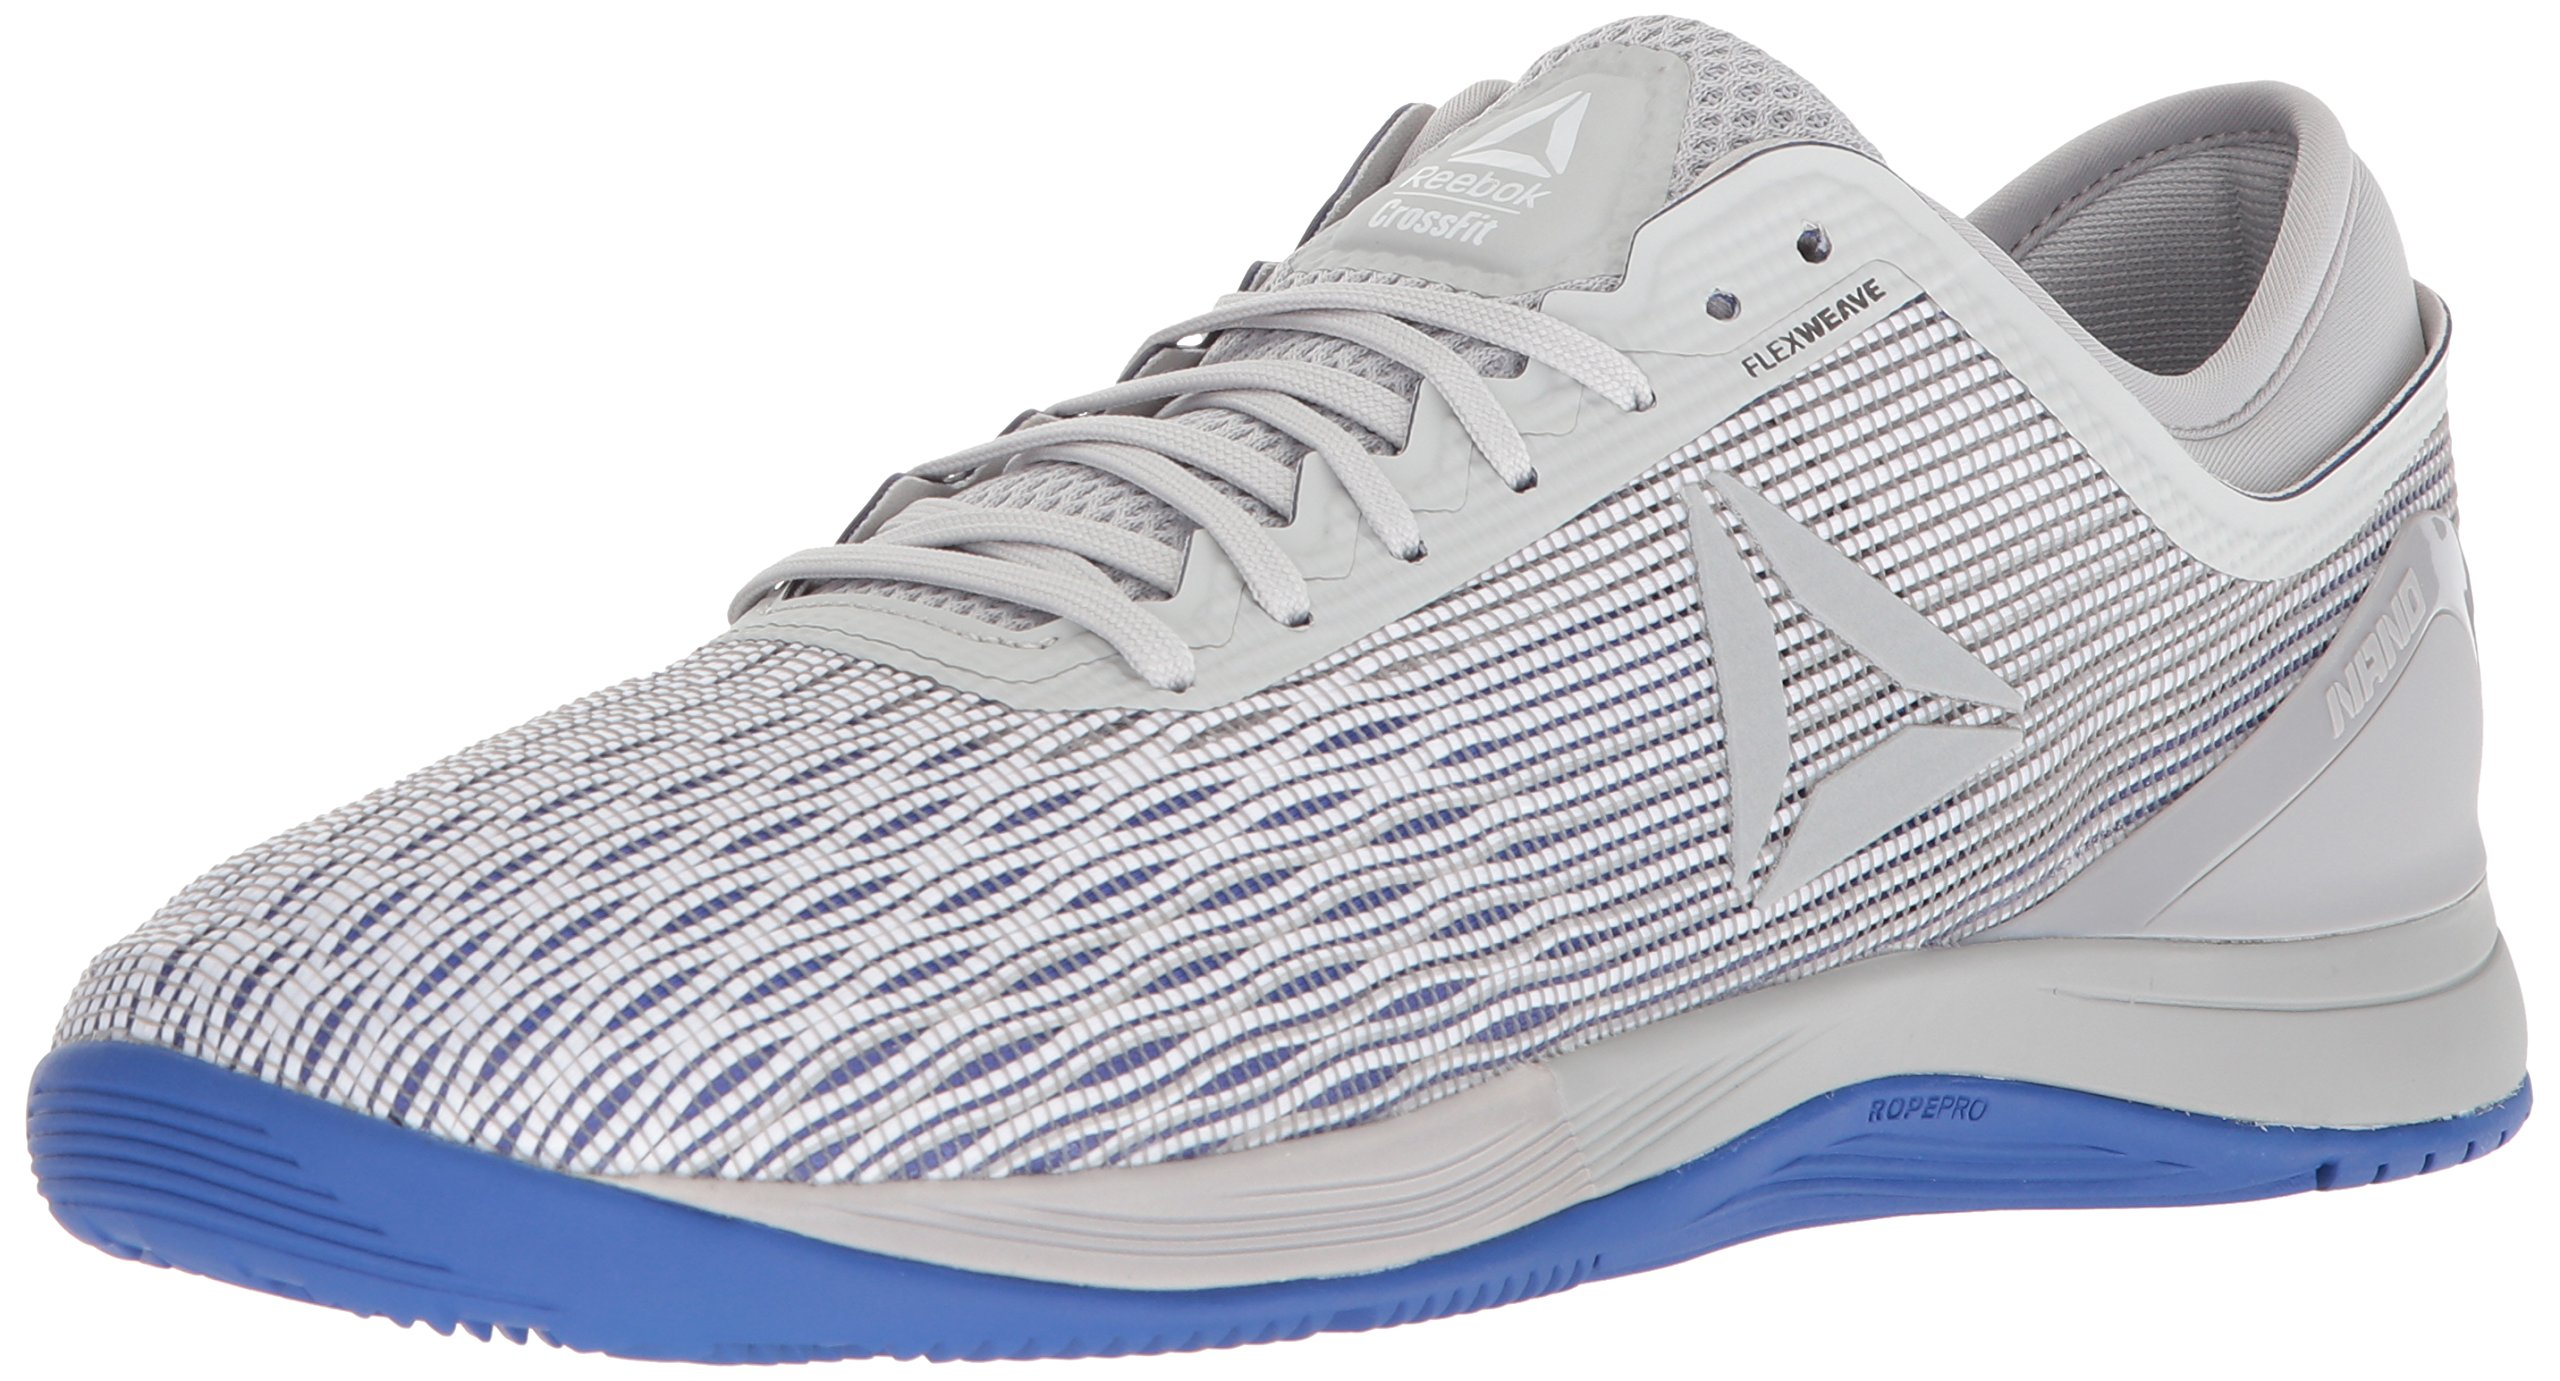 Reebok Men's CROSSFIT Nano 8.0 Sneaker, White/Stark Grey/Skull GR, 6.5 M US